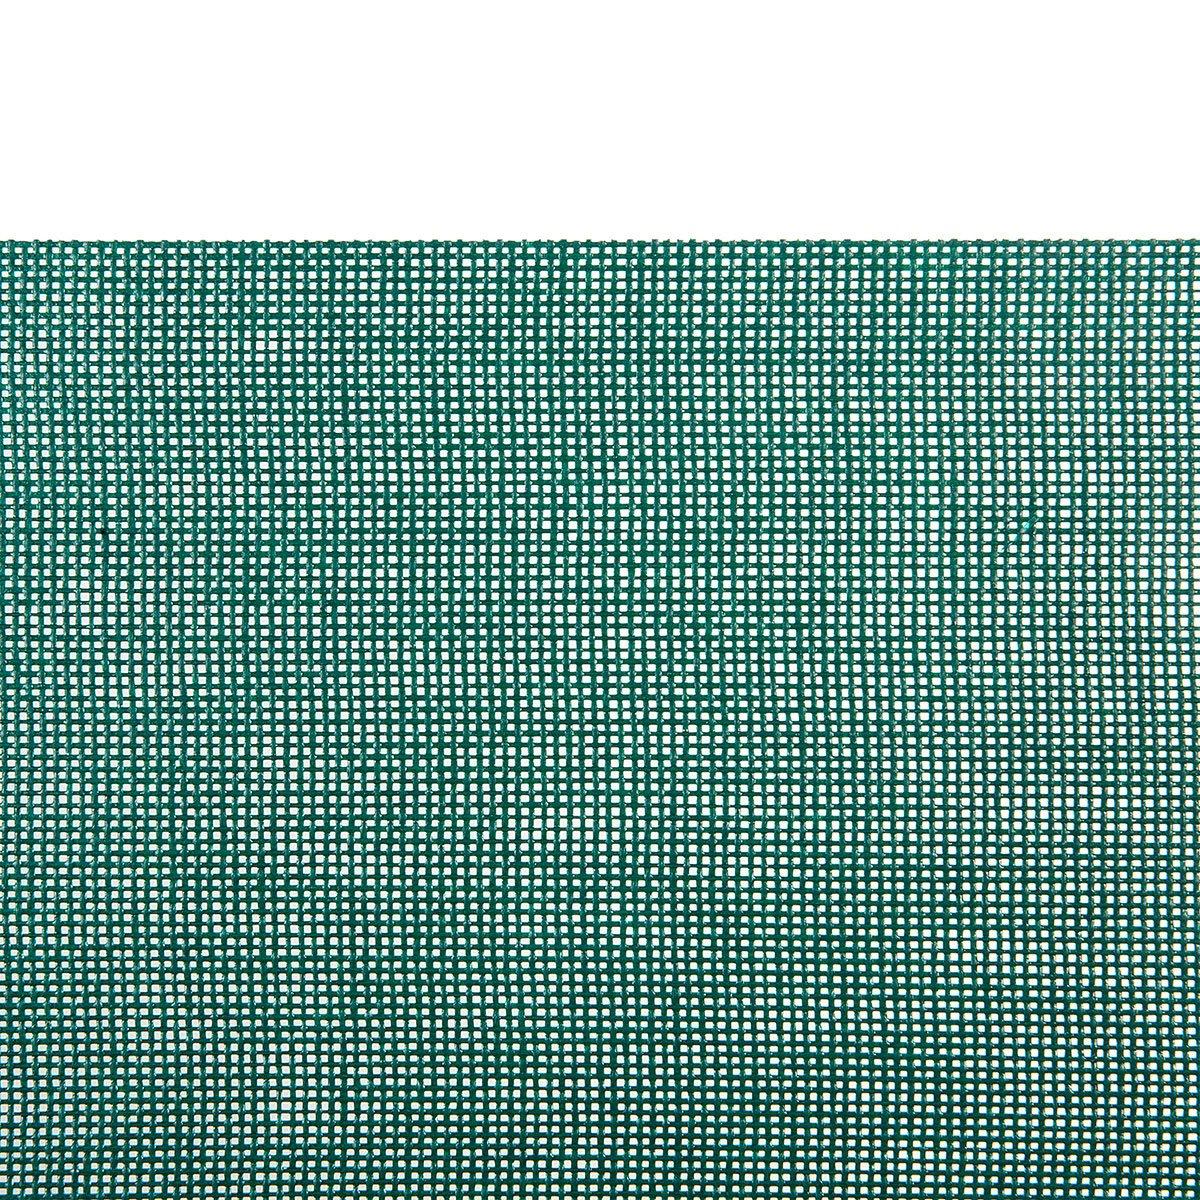 WINDSCHUTZGEWEBE fein Windschutznetz Windschutzgitter Windschutz Wetterschutz (METERWARE) (100 cm Breite) Zill